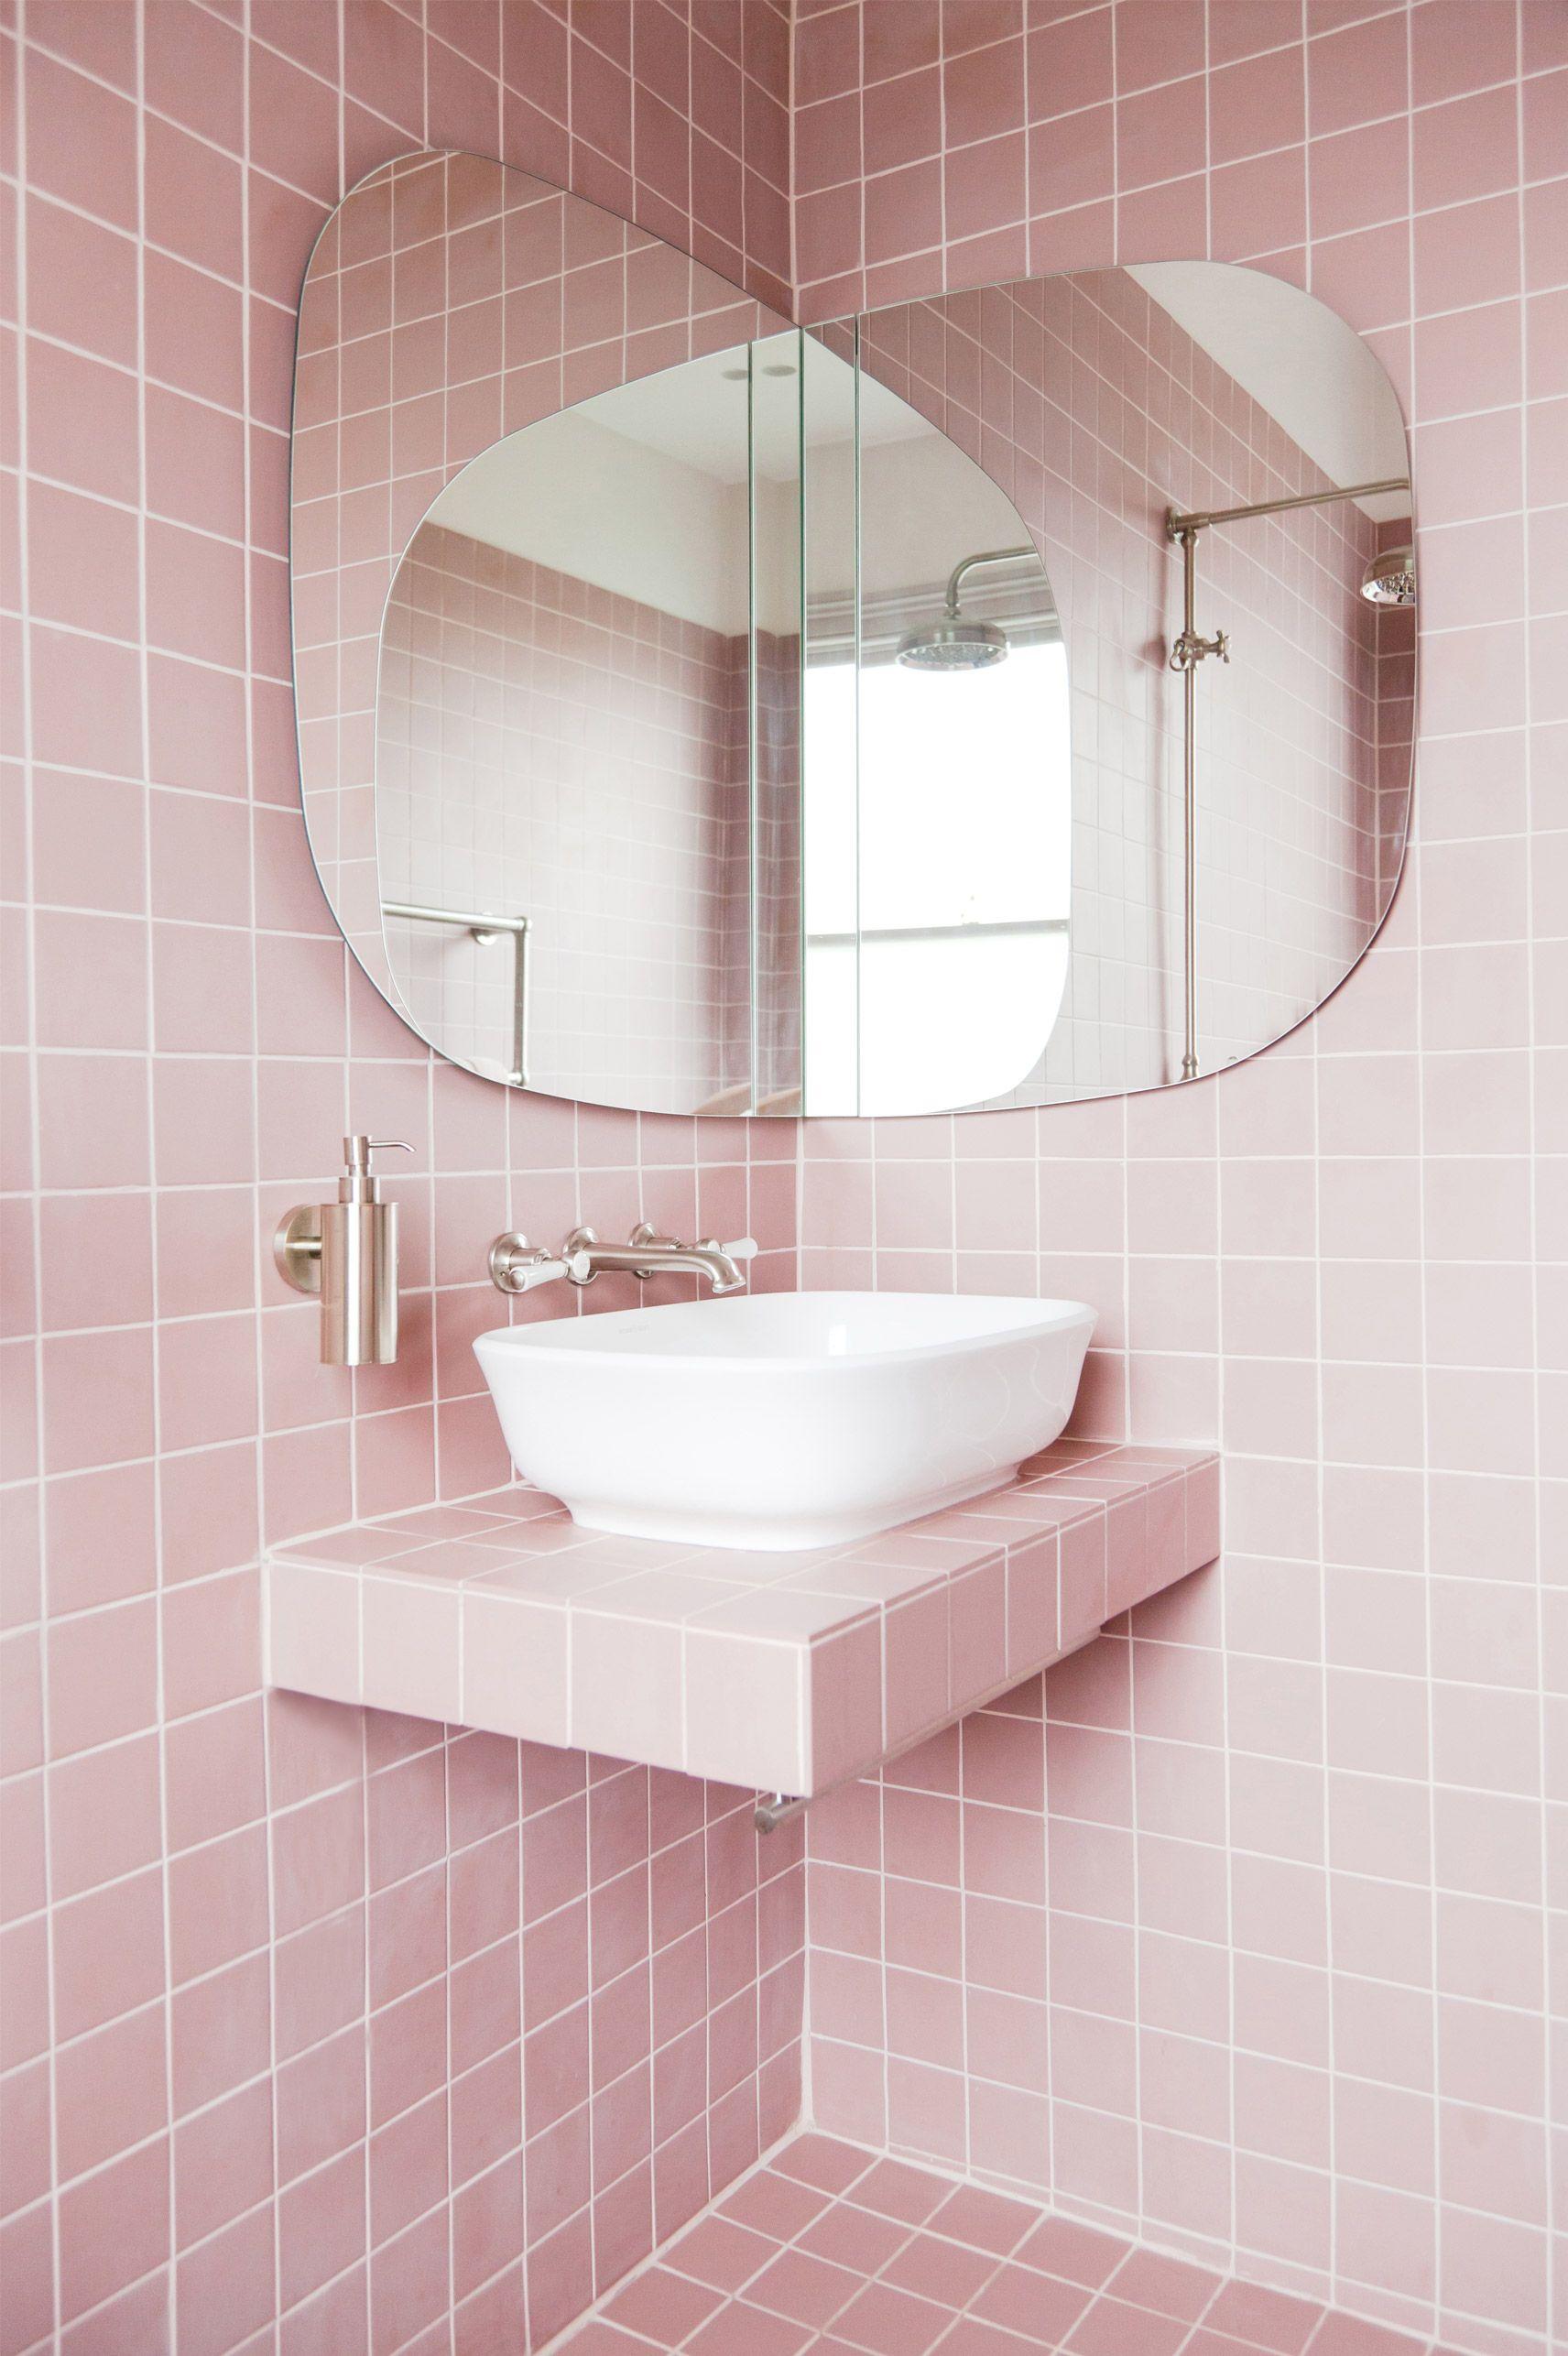 Bathroom Tiles Gallery Ideas Image Of Bathroom And Closet